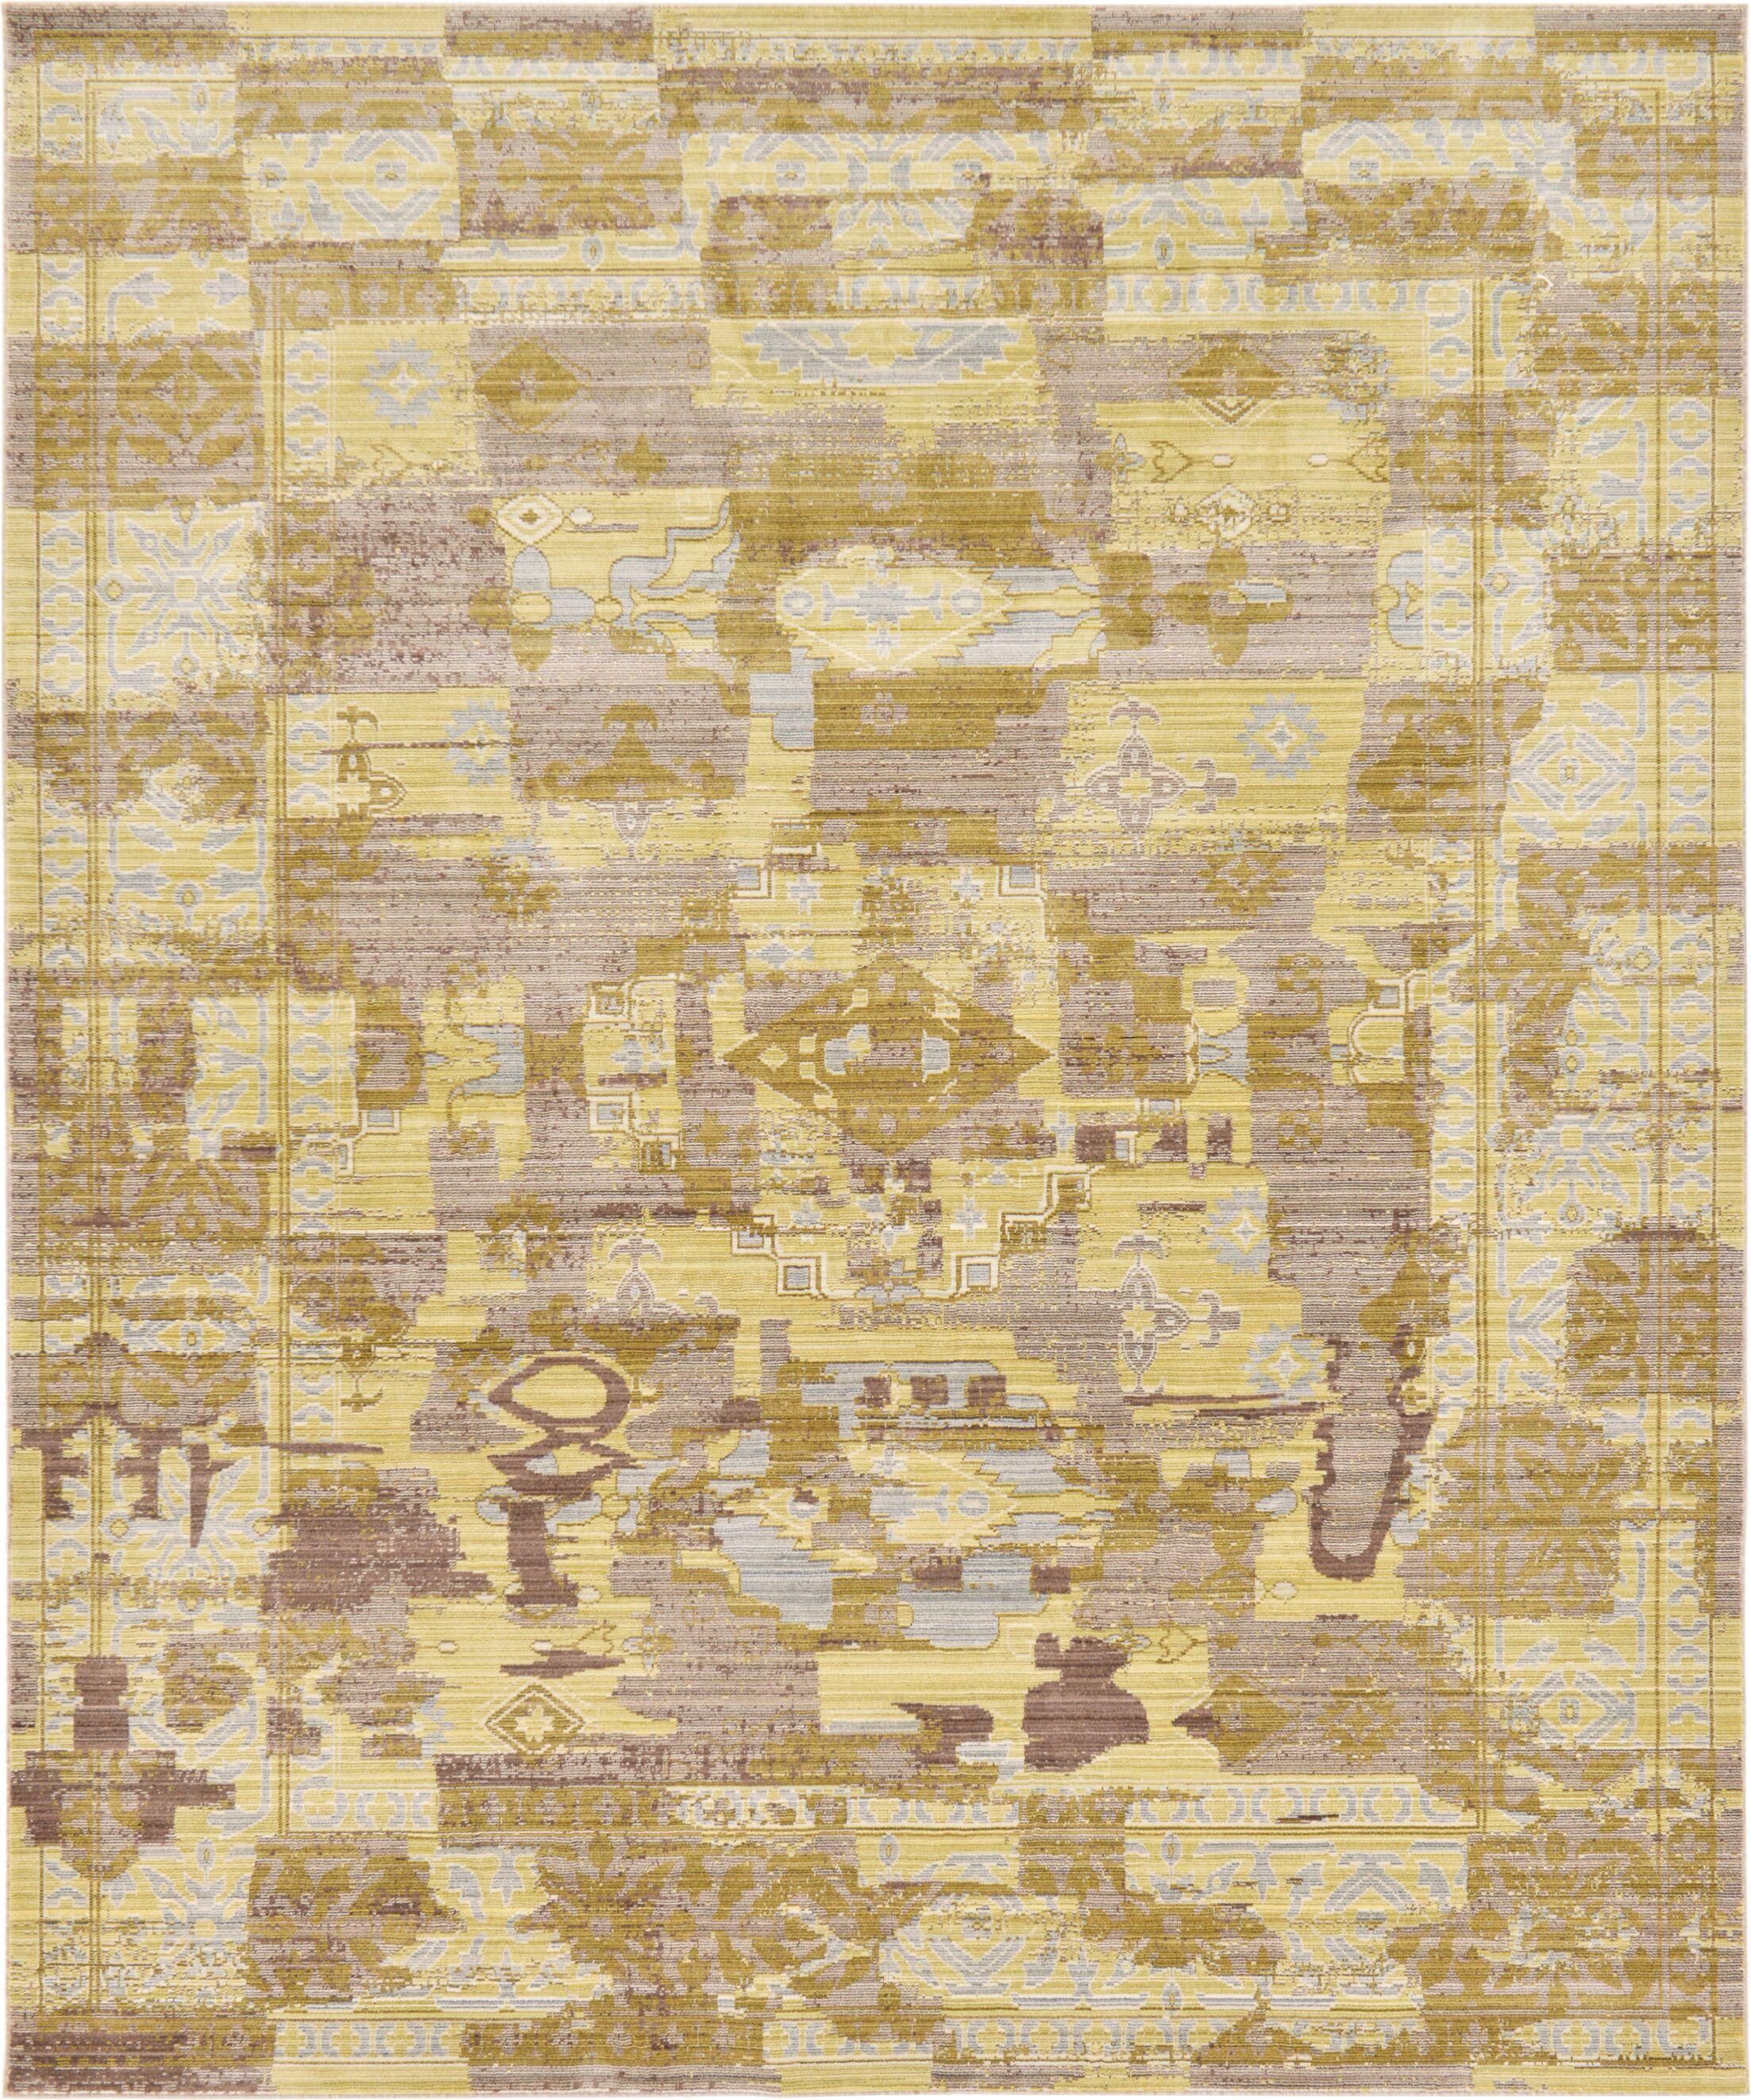 Rune Light Brown Area Rug Rug Size: Rectangle 8' x 10'